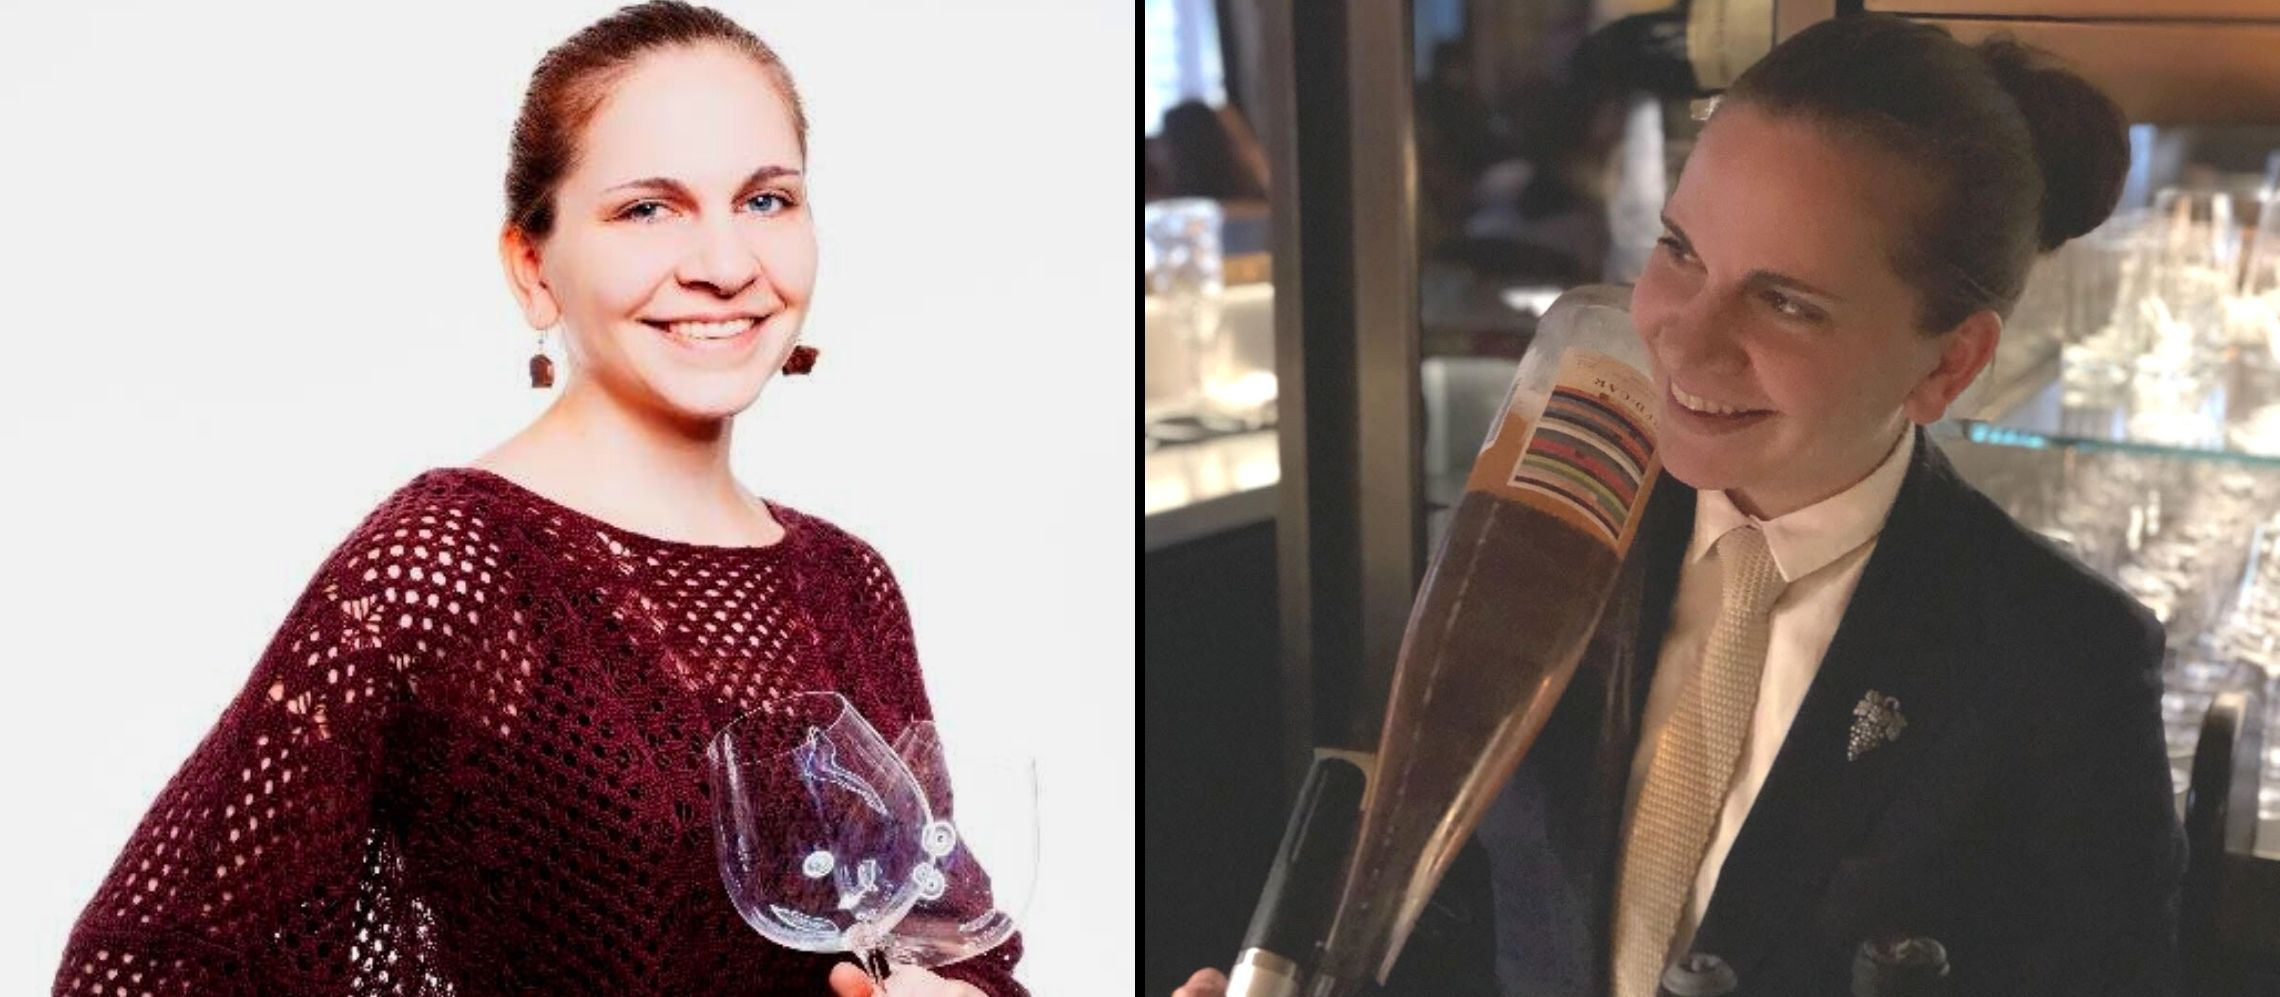 Photo for: Heidi Mäkinen MW on creating the sommelier's dream wine list